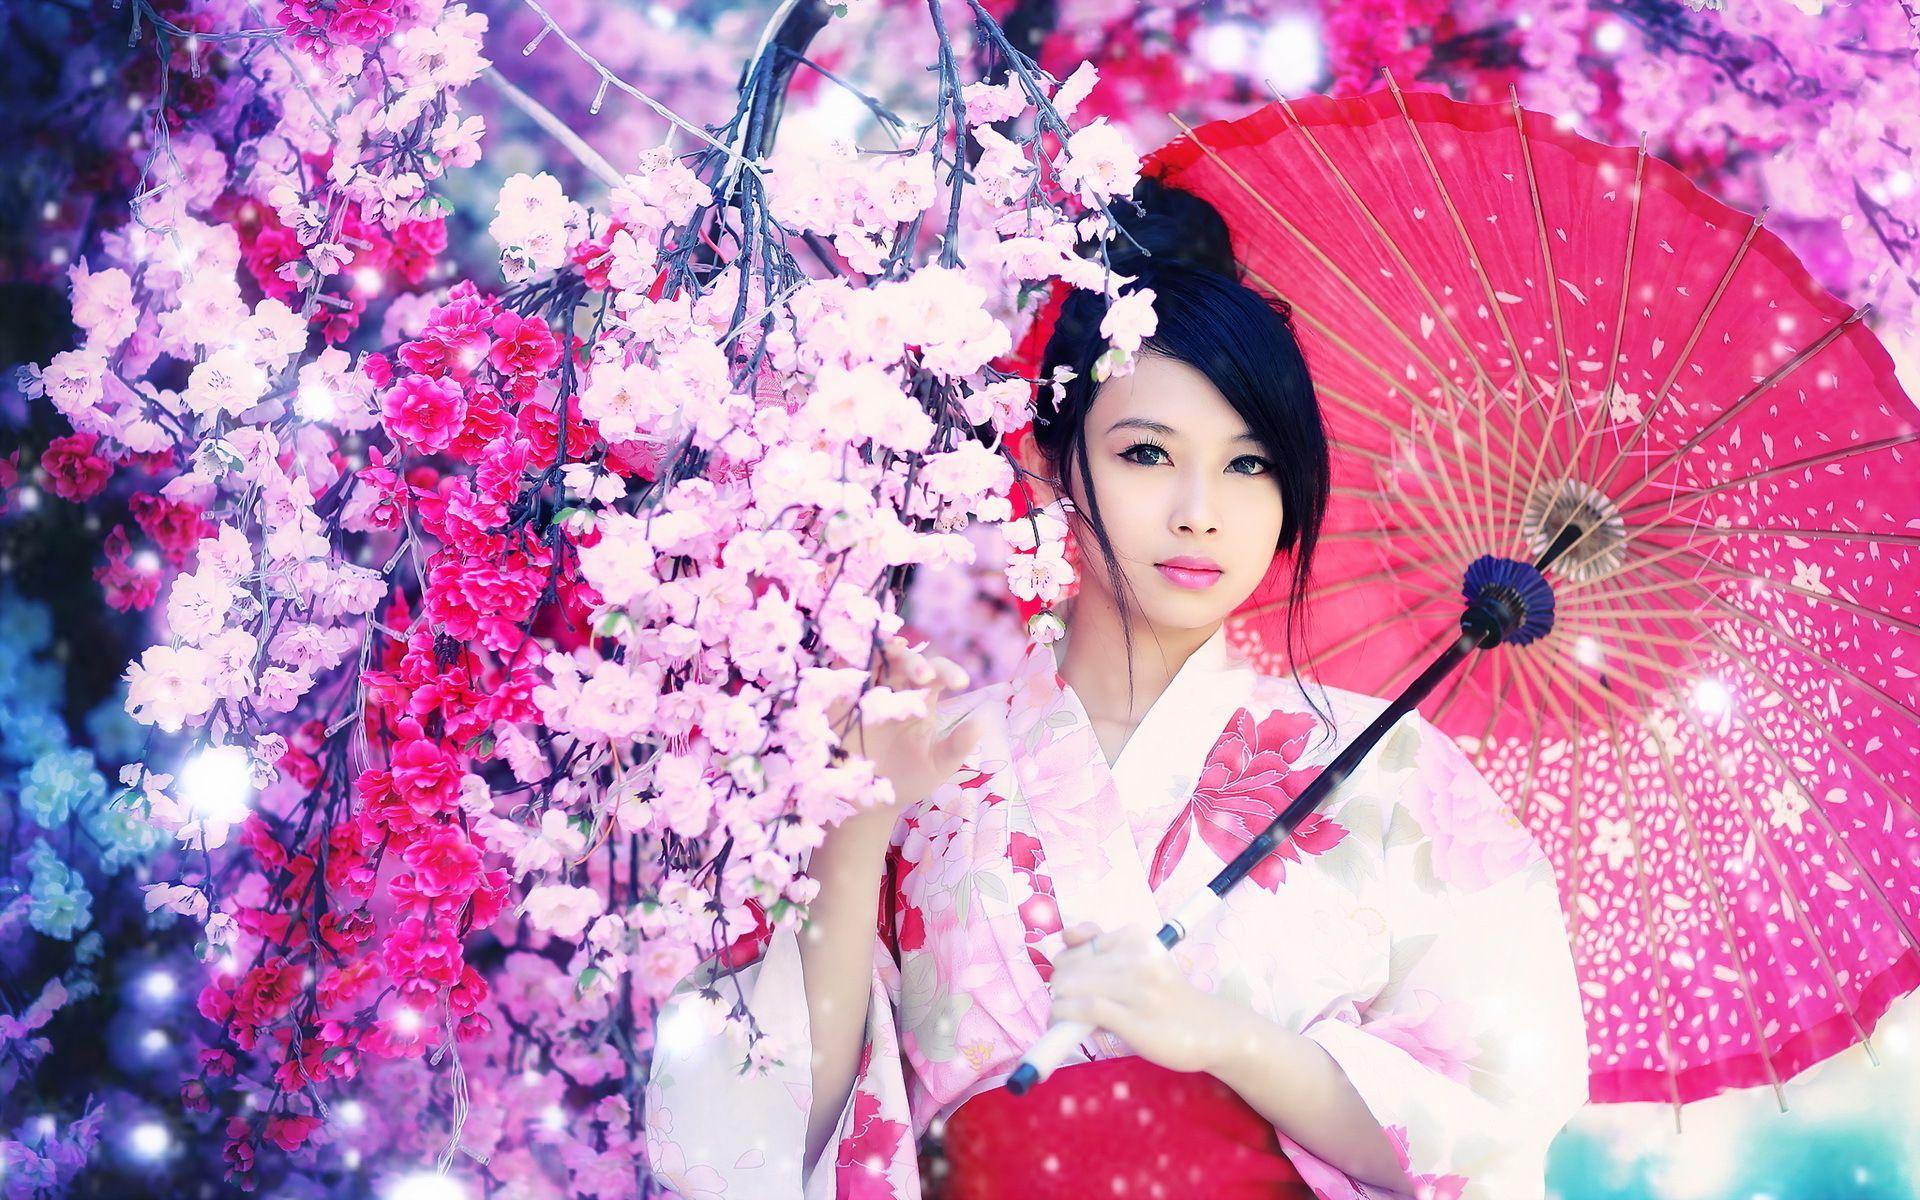 Geisha Wallpaper 39734 1920x1200